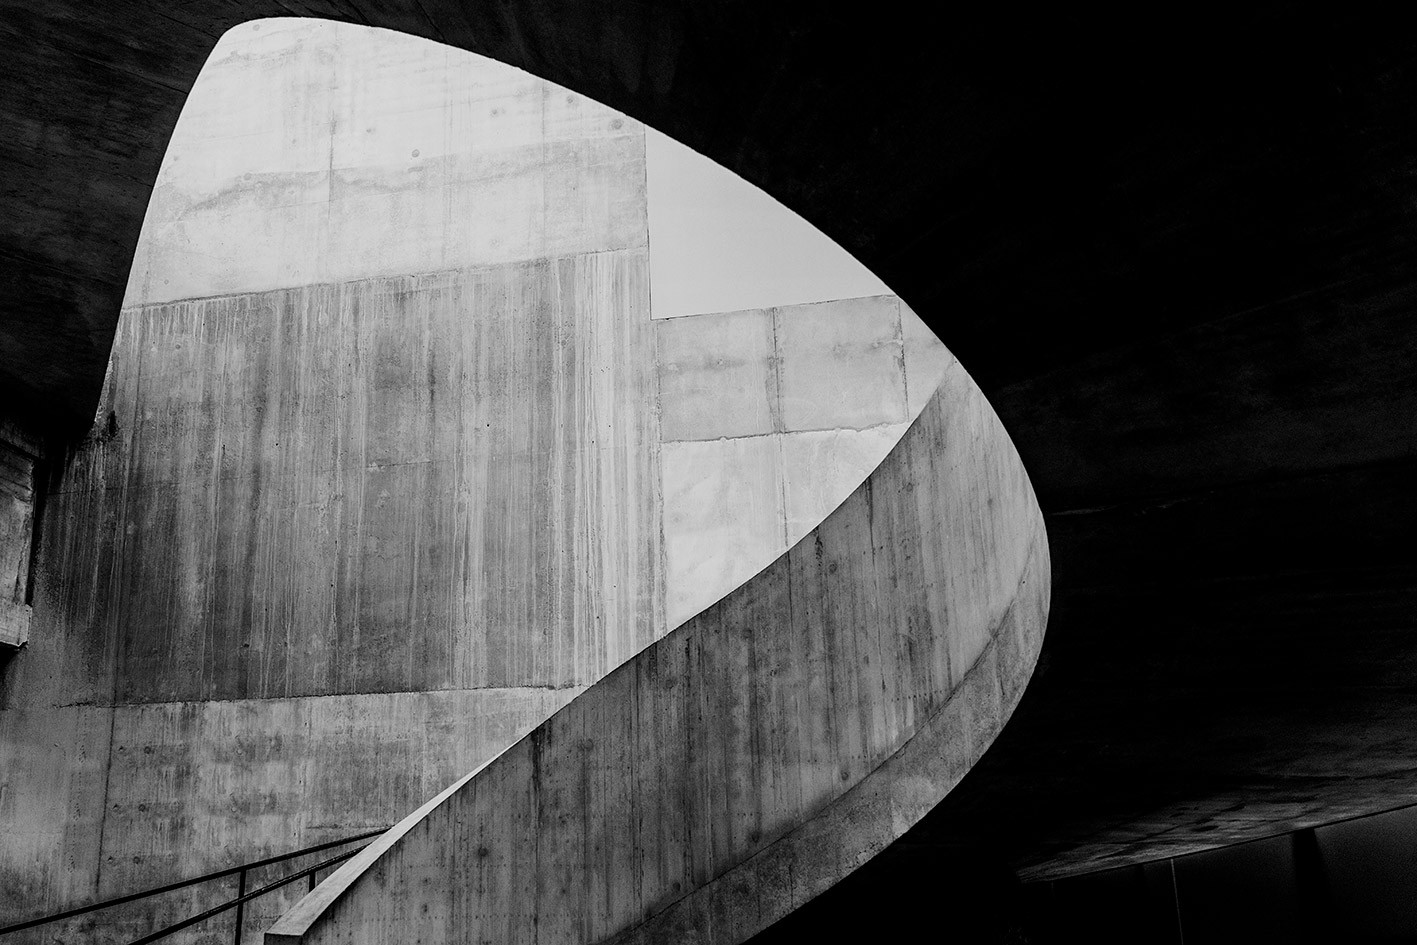 Tate Modern #03